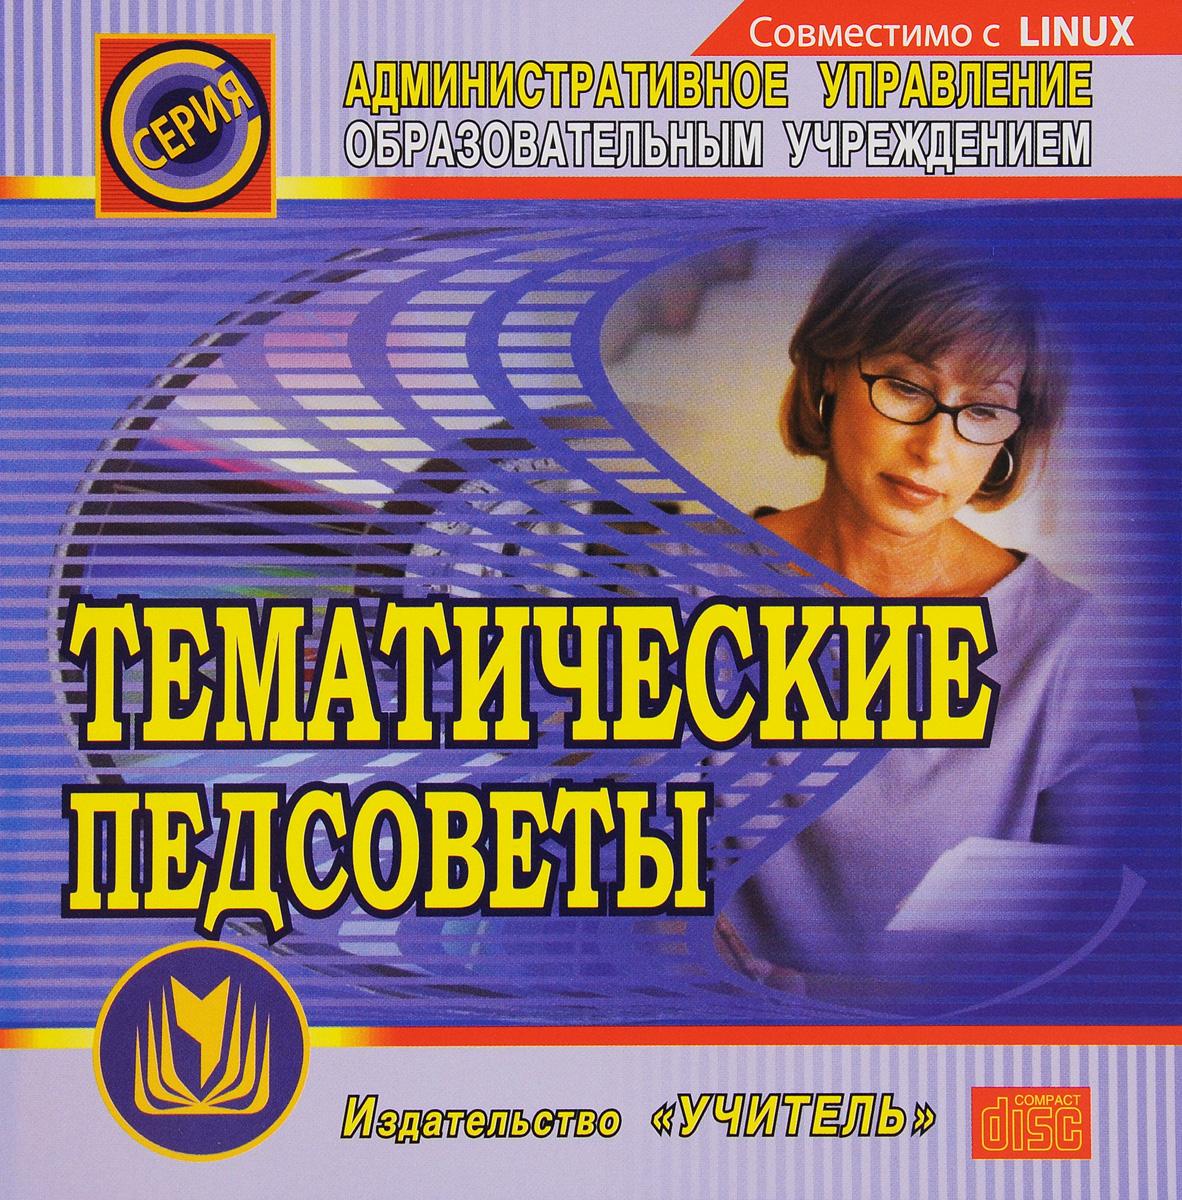 Zakazat.ru Тематические педсоветы